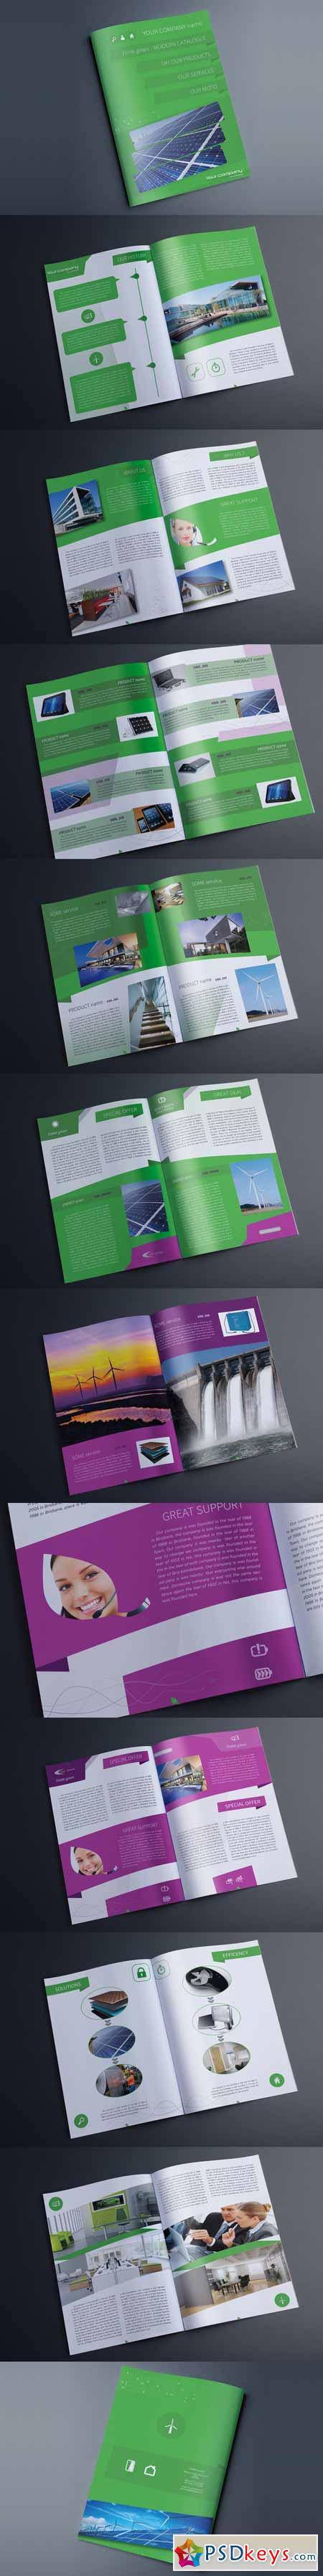 Indesign Multipurpose Green Catalog 550309